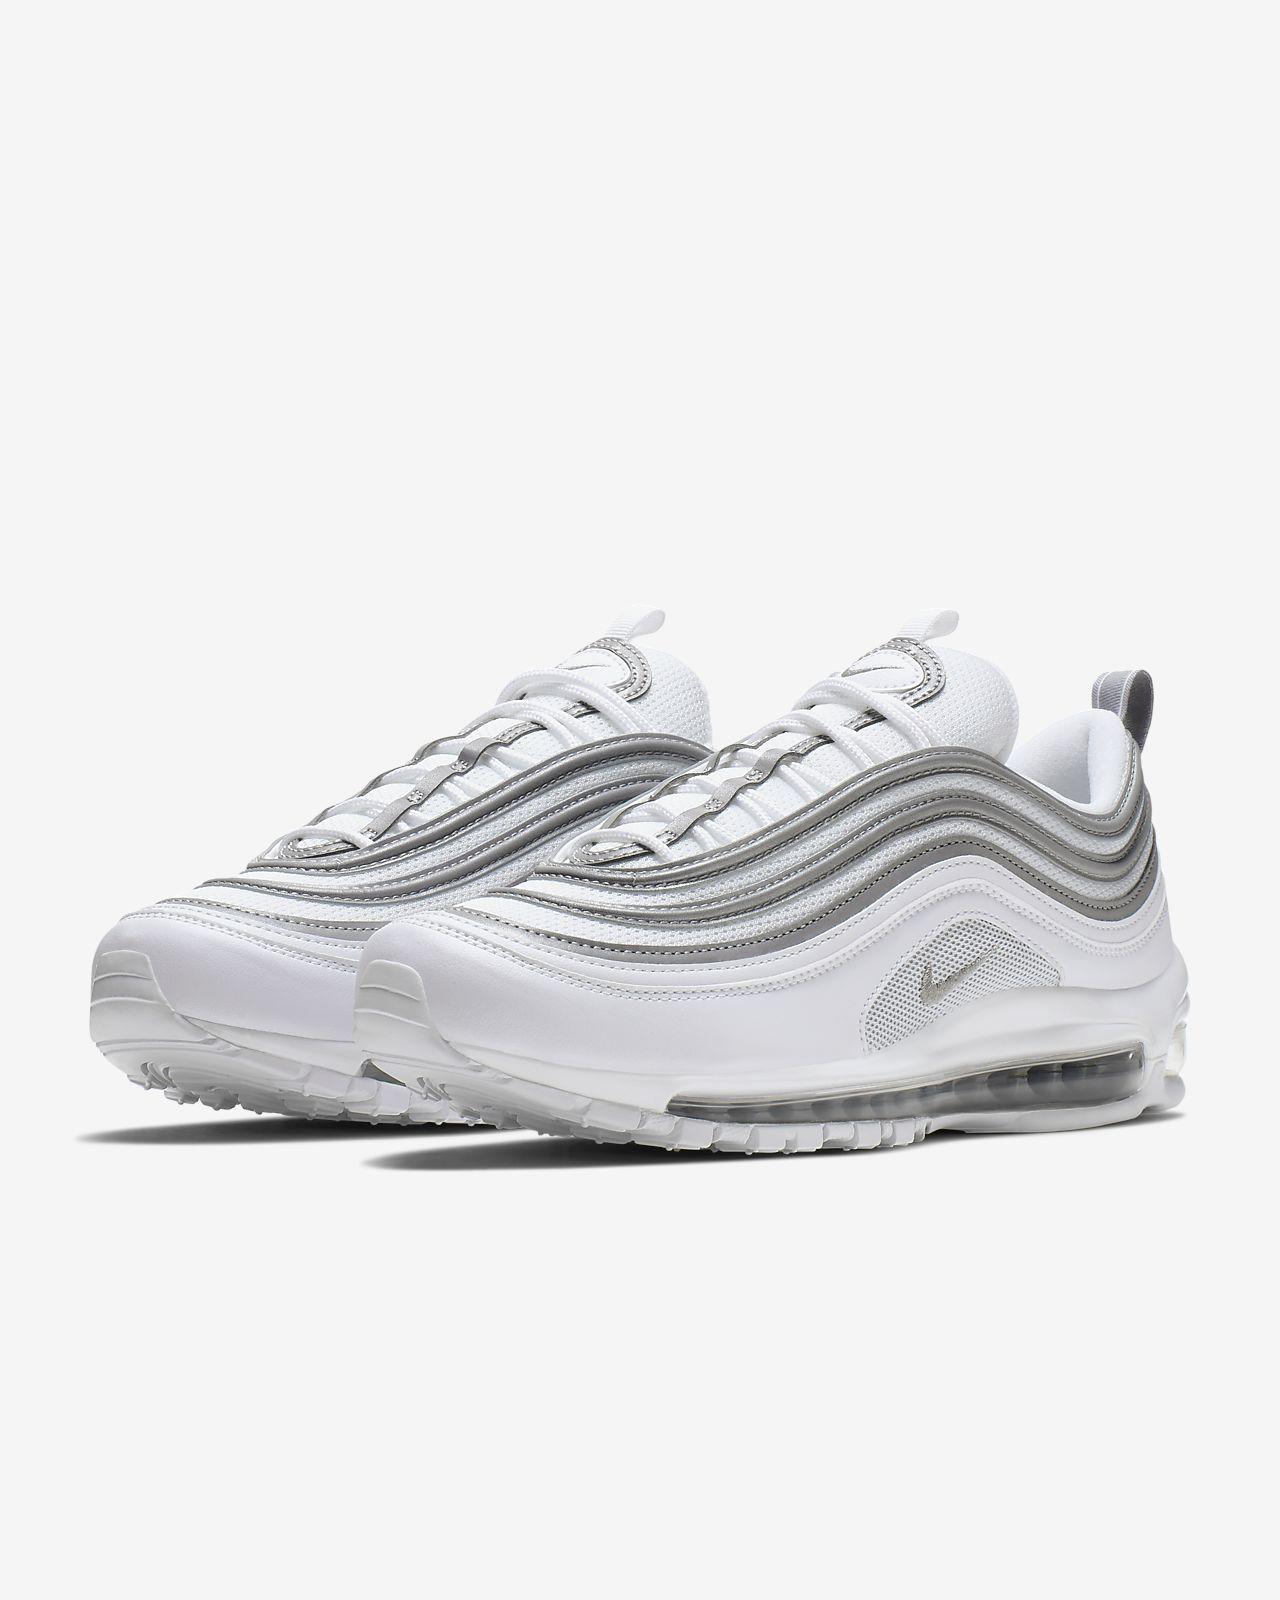 hot sales d818f aa57b Nike Air Max 97 Men's Shoe